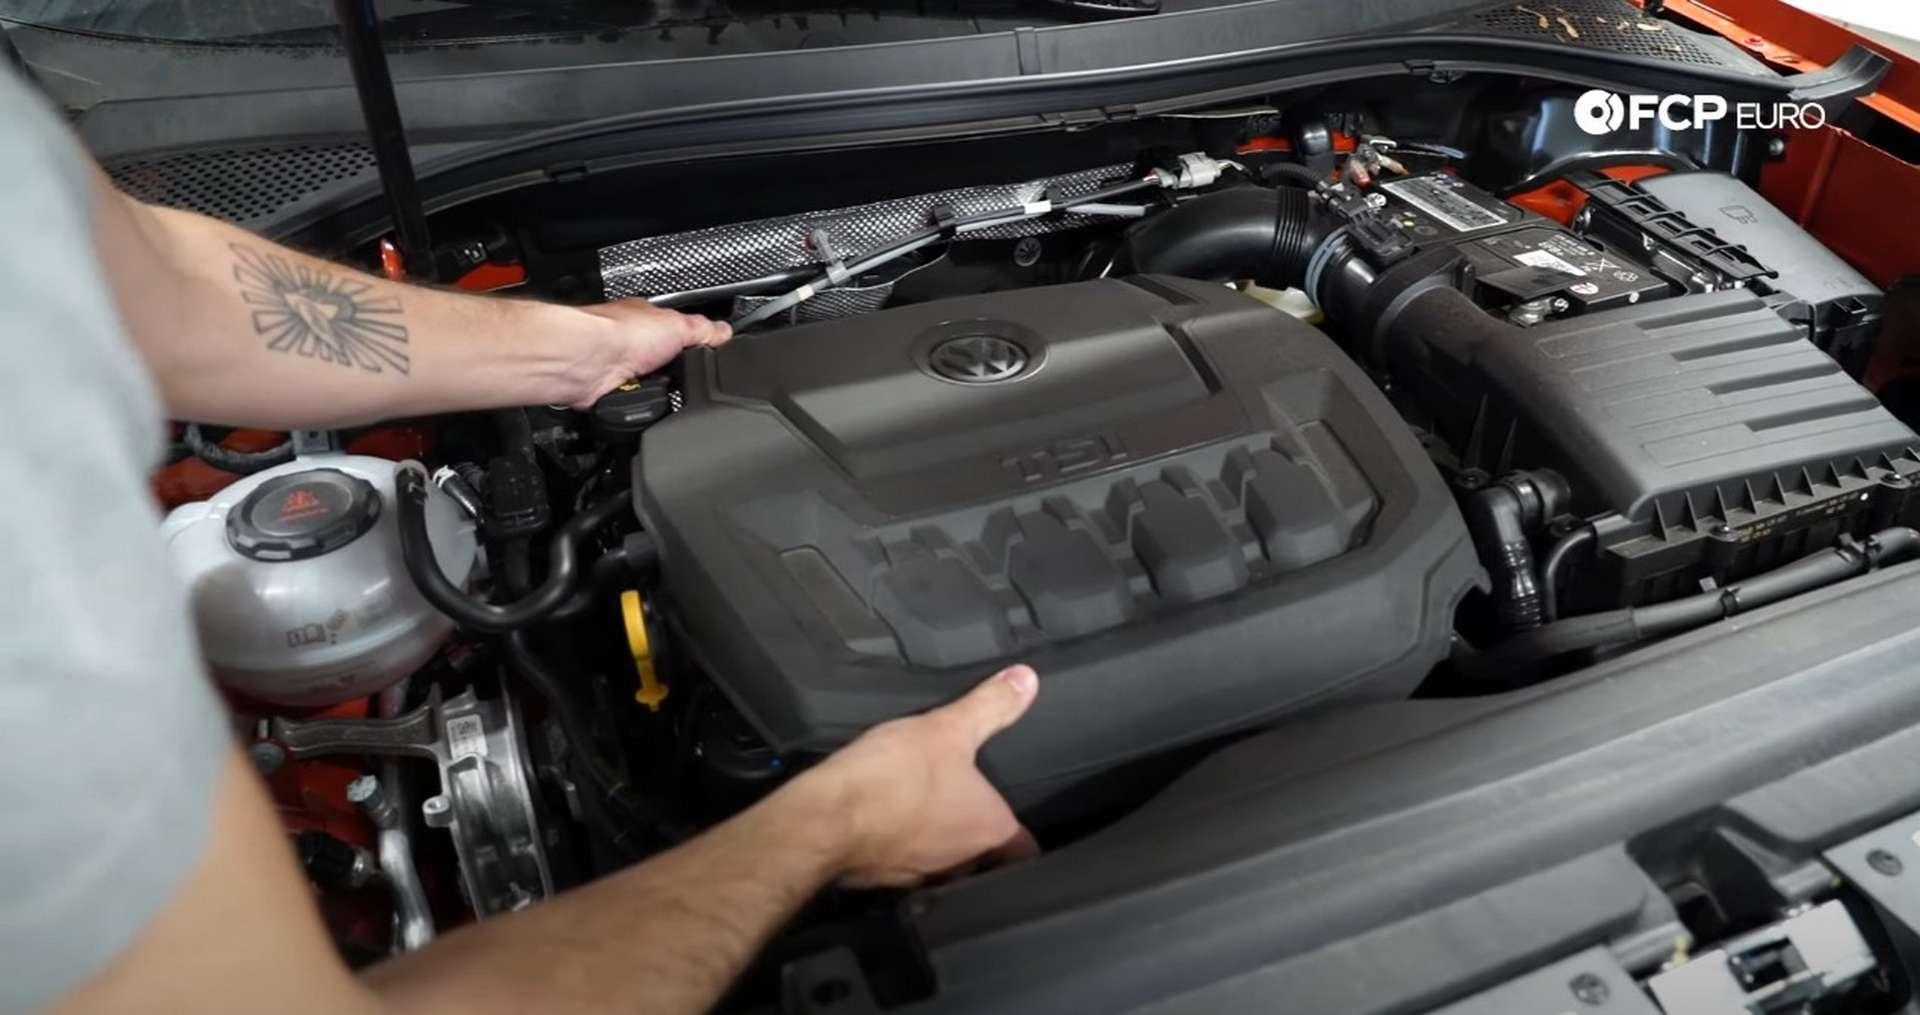 DIY Volkswagen EA888 Oil Change removing the engine cover